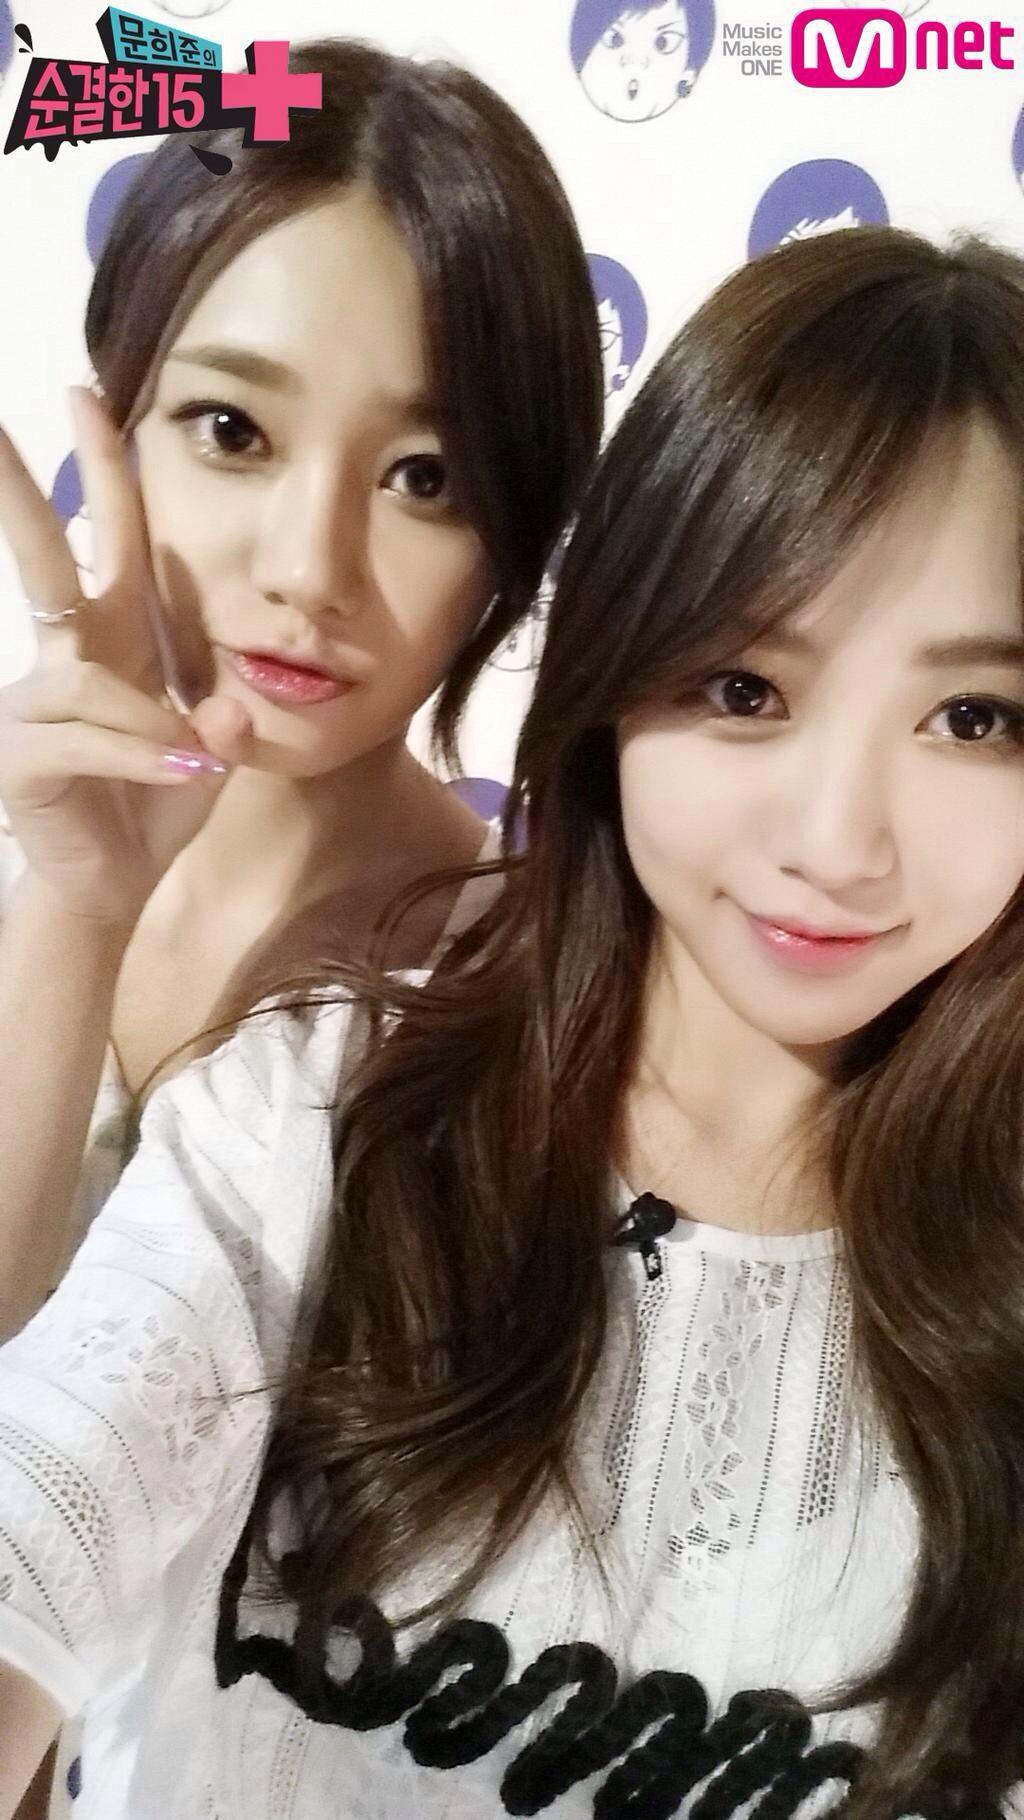 Pin By Linex On Kpop Goddesses Aoa Seolhyun Kpop